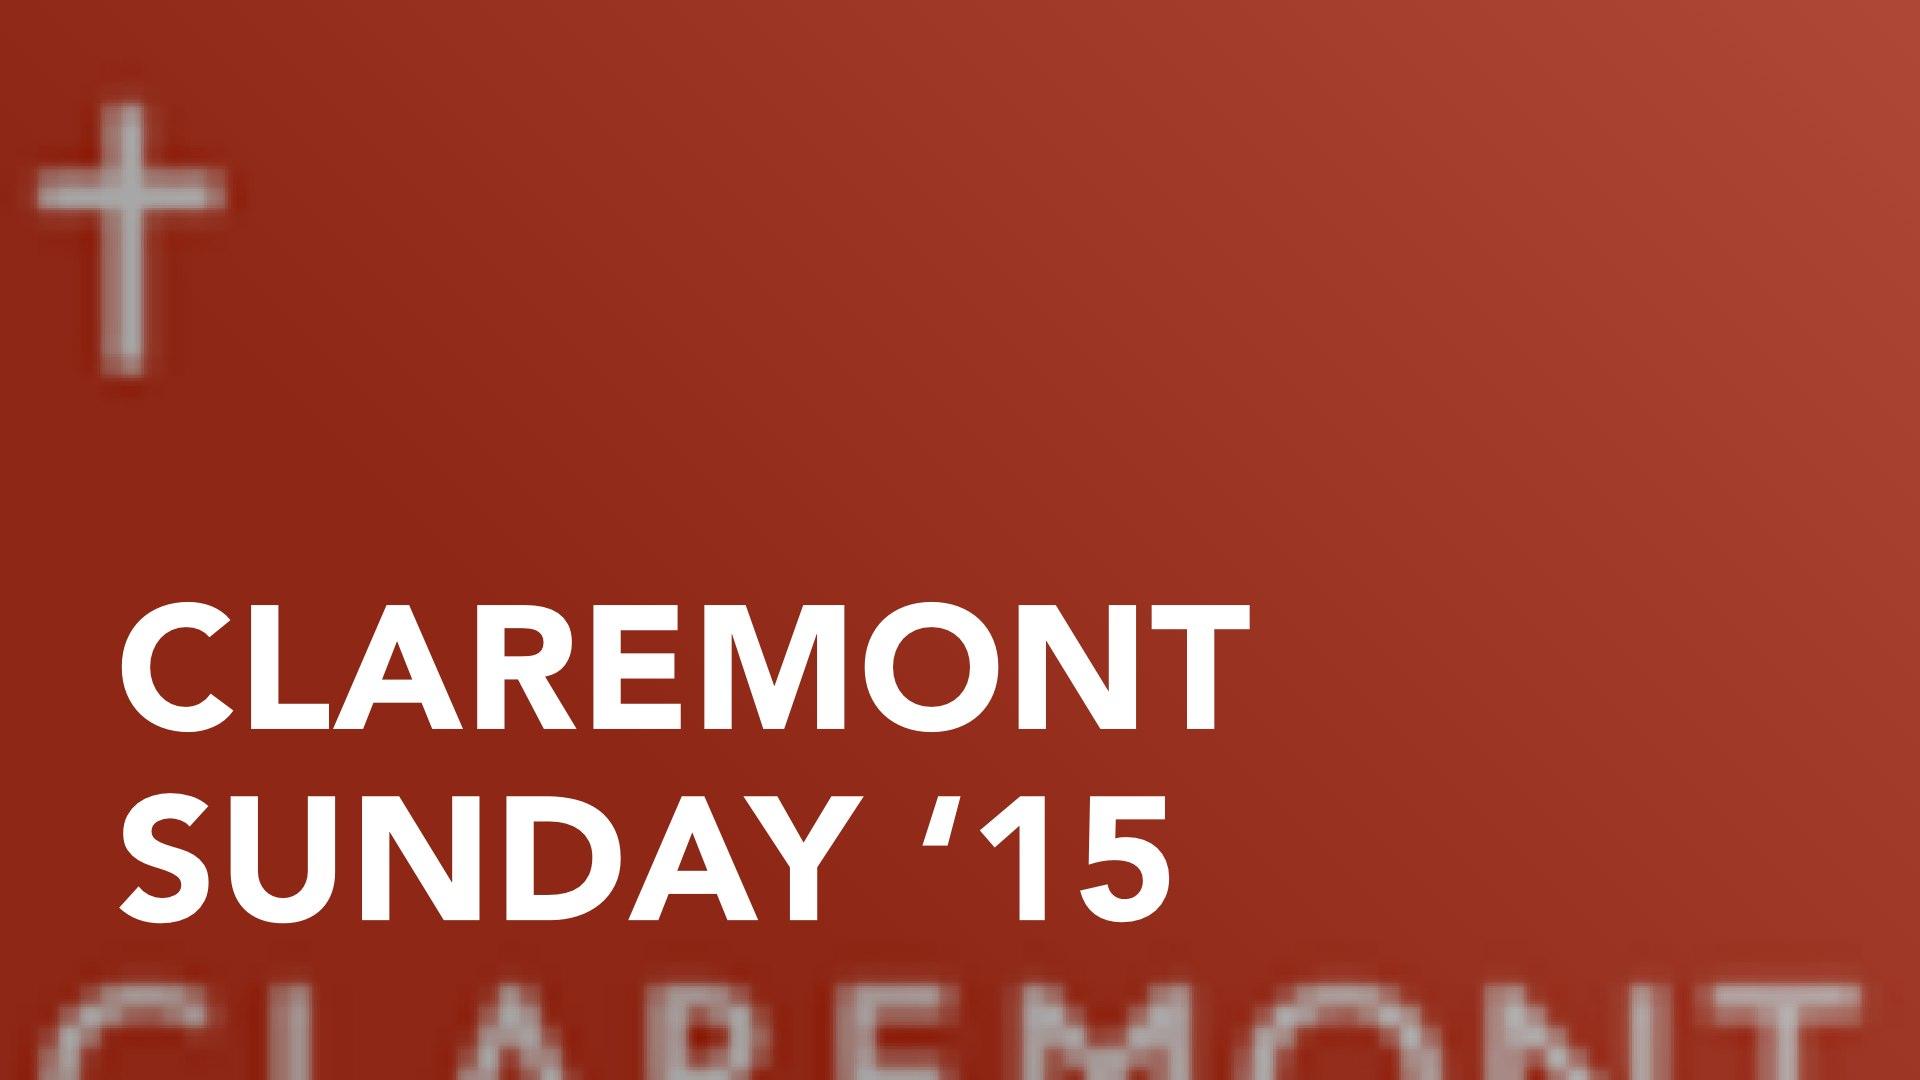 claremont-sunday-15